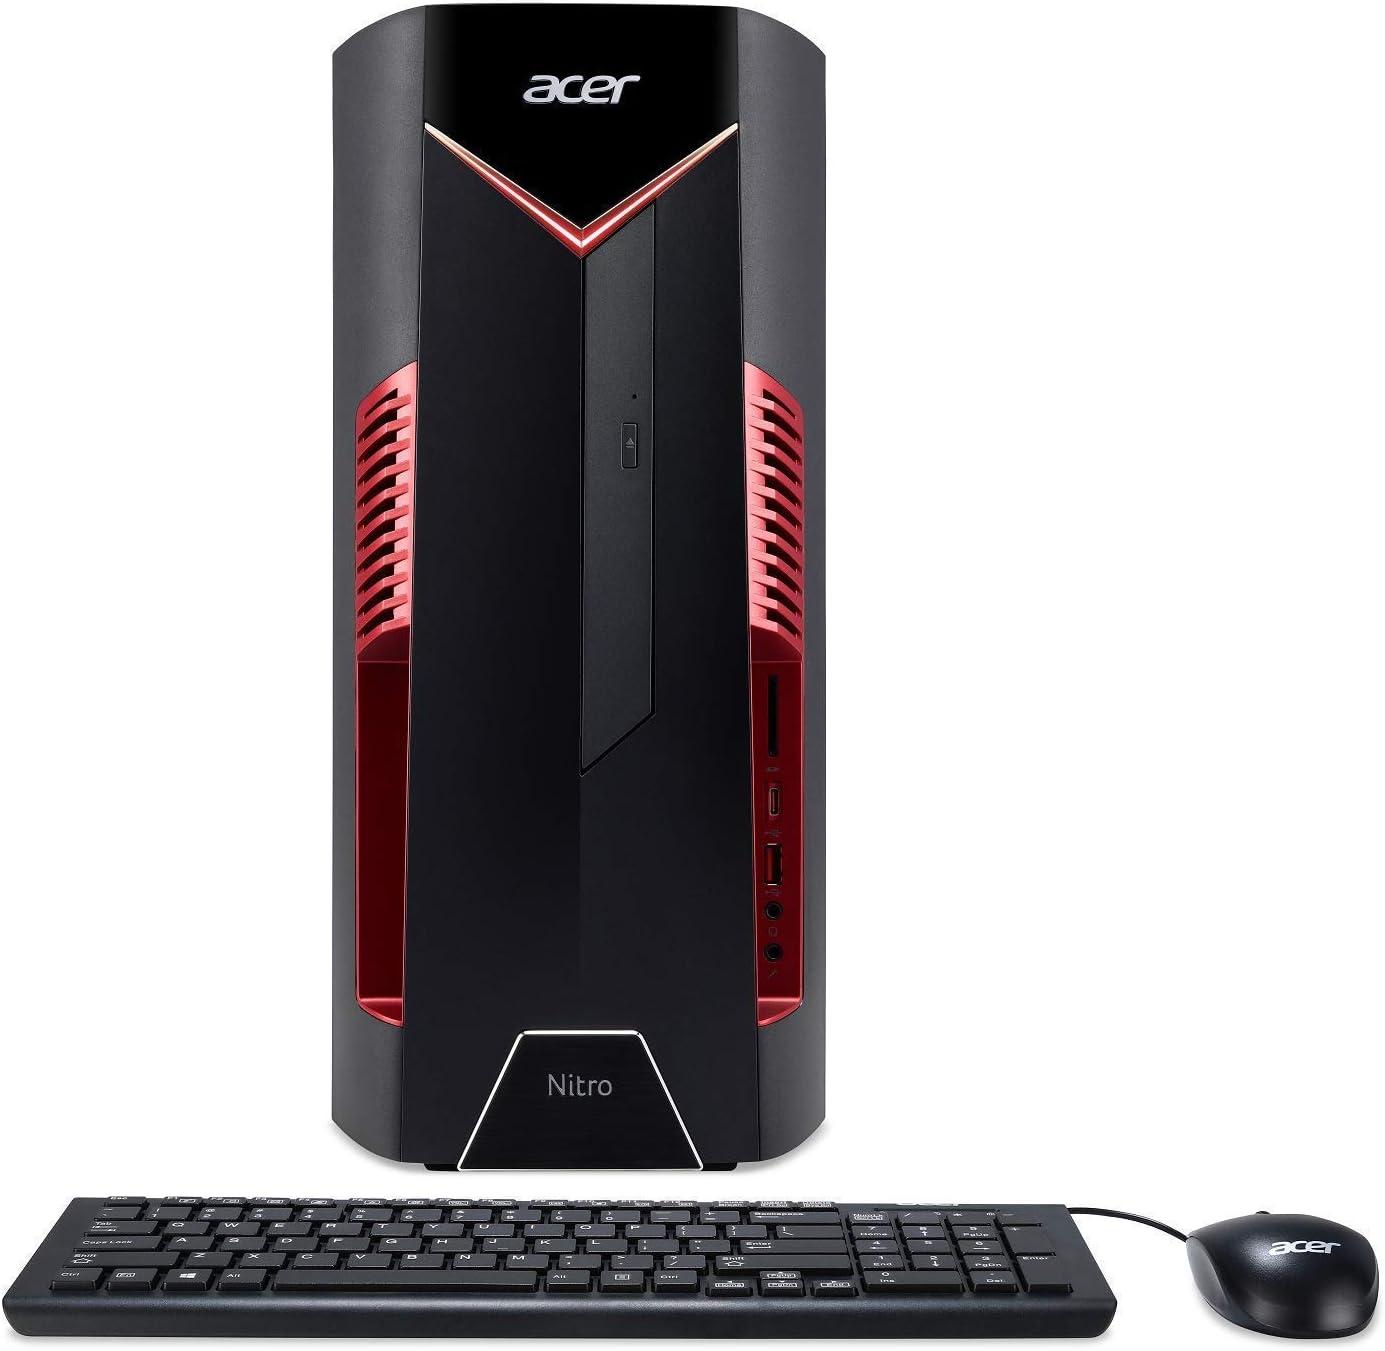 Acer Nitro 50 N50-600-NESelecti7RX580 Desktop, 8th Gen Intel Core i7-8700, AMD Radeon RX 580 Graphics, 8GB DDR4 + 16GB Optane Memory, 1TB HDD, Windows 10 Home (Renewed)